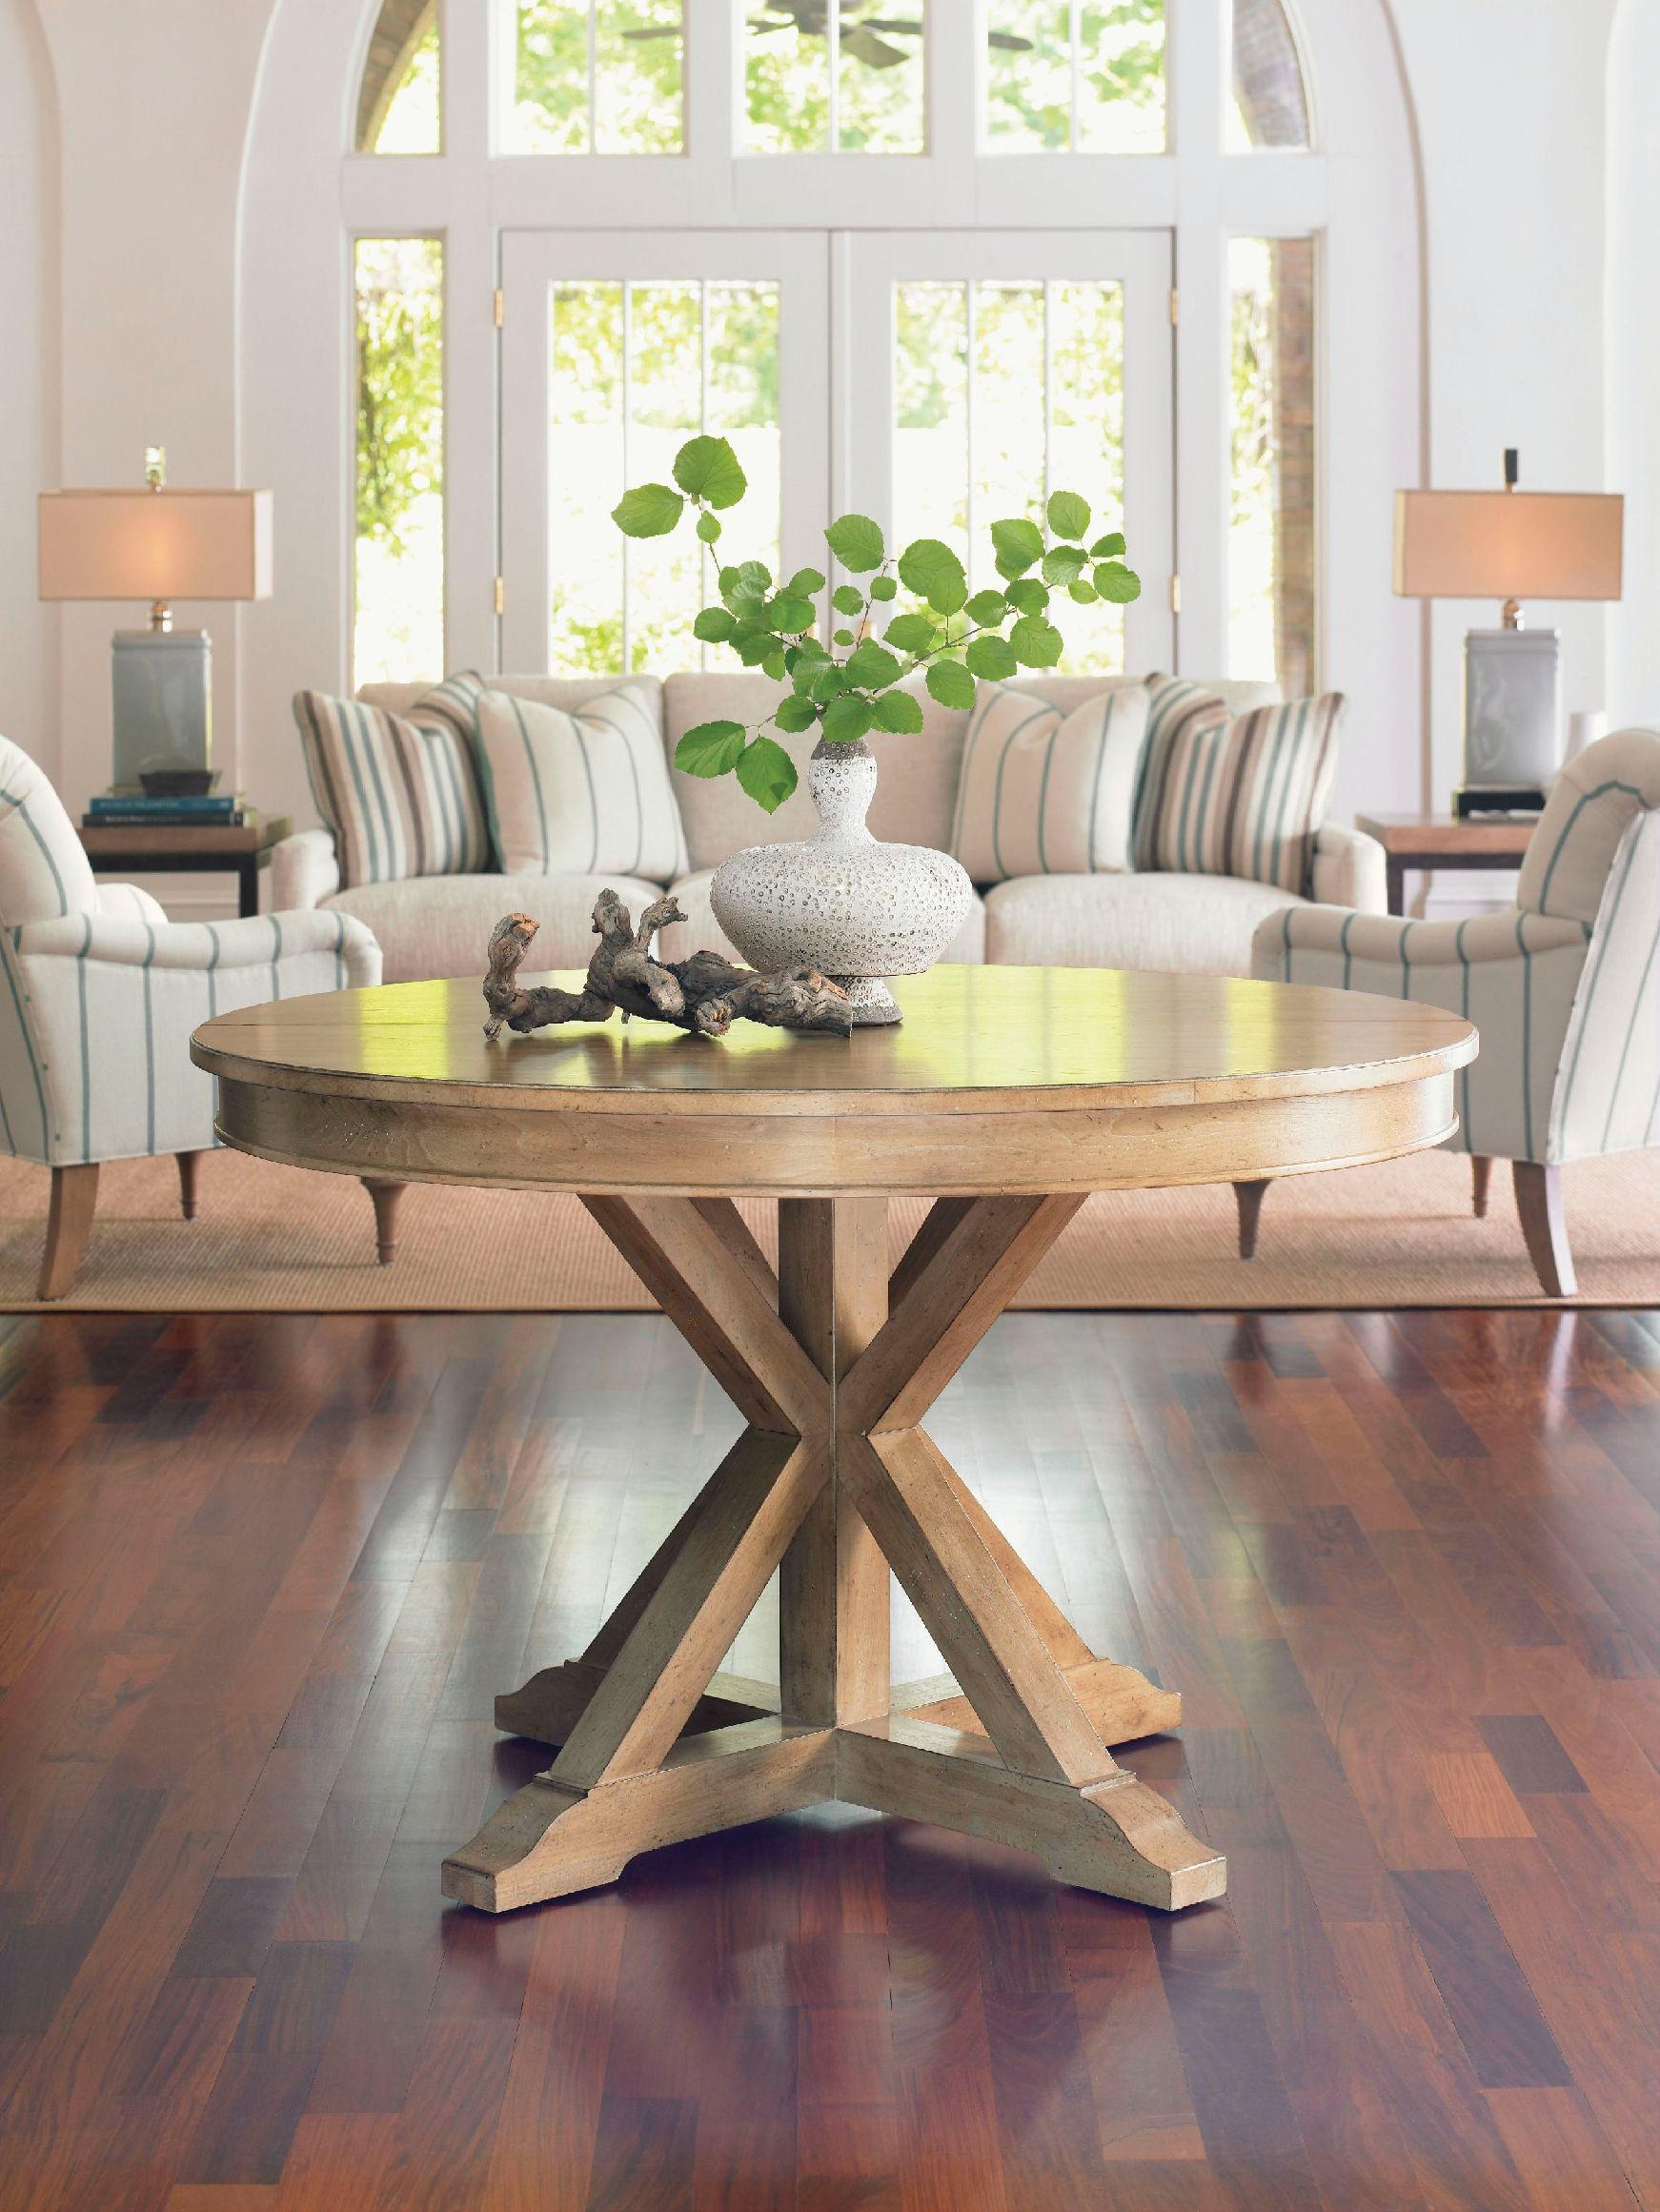 Lexington Furniture San Marcos Dining Table 830 870C